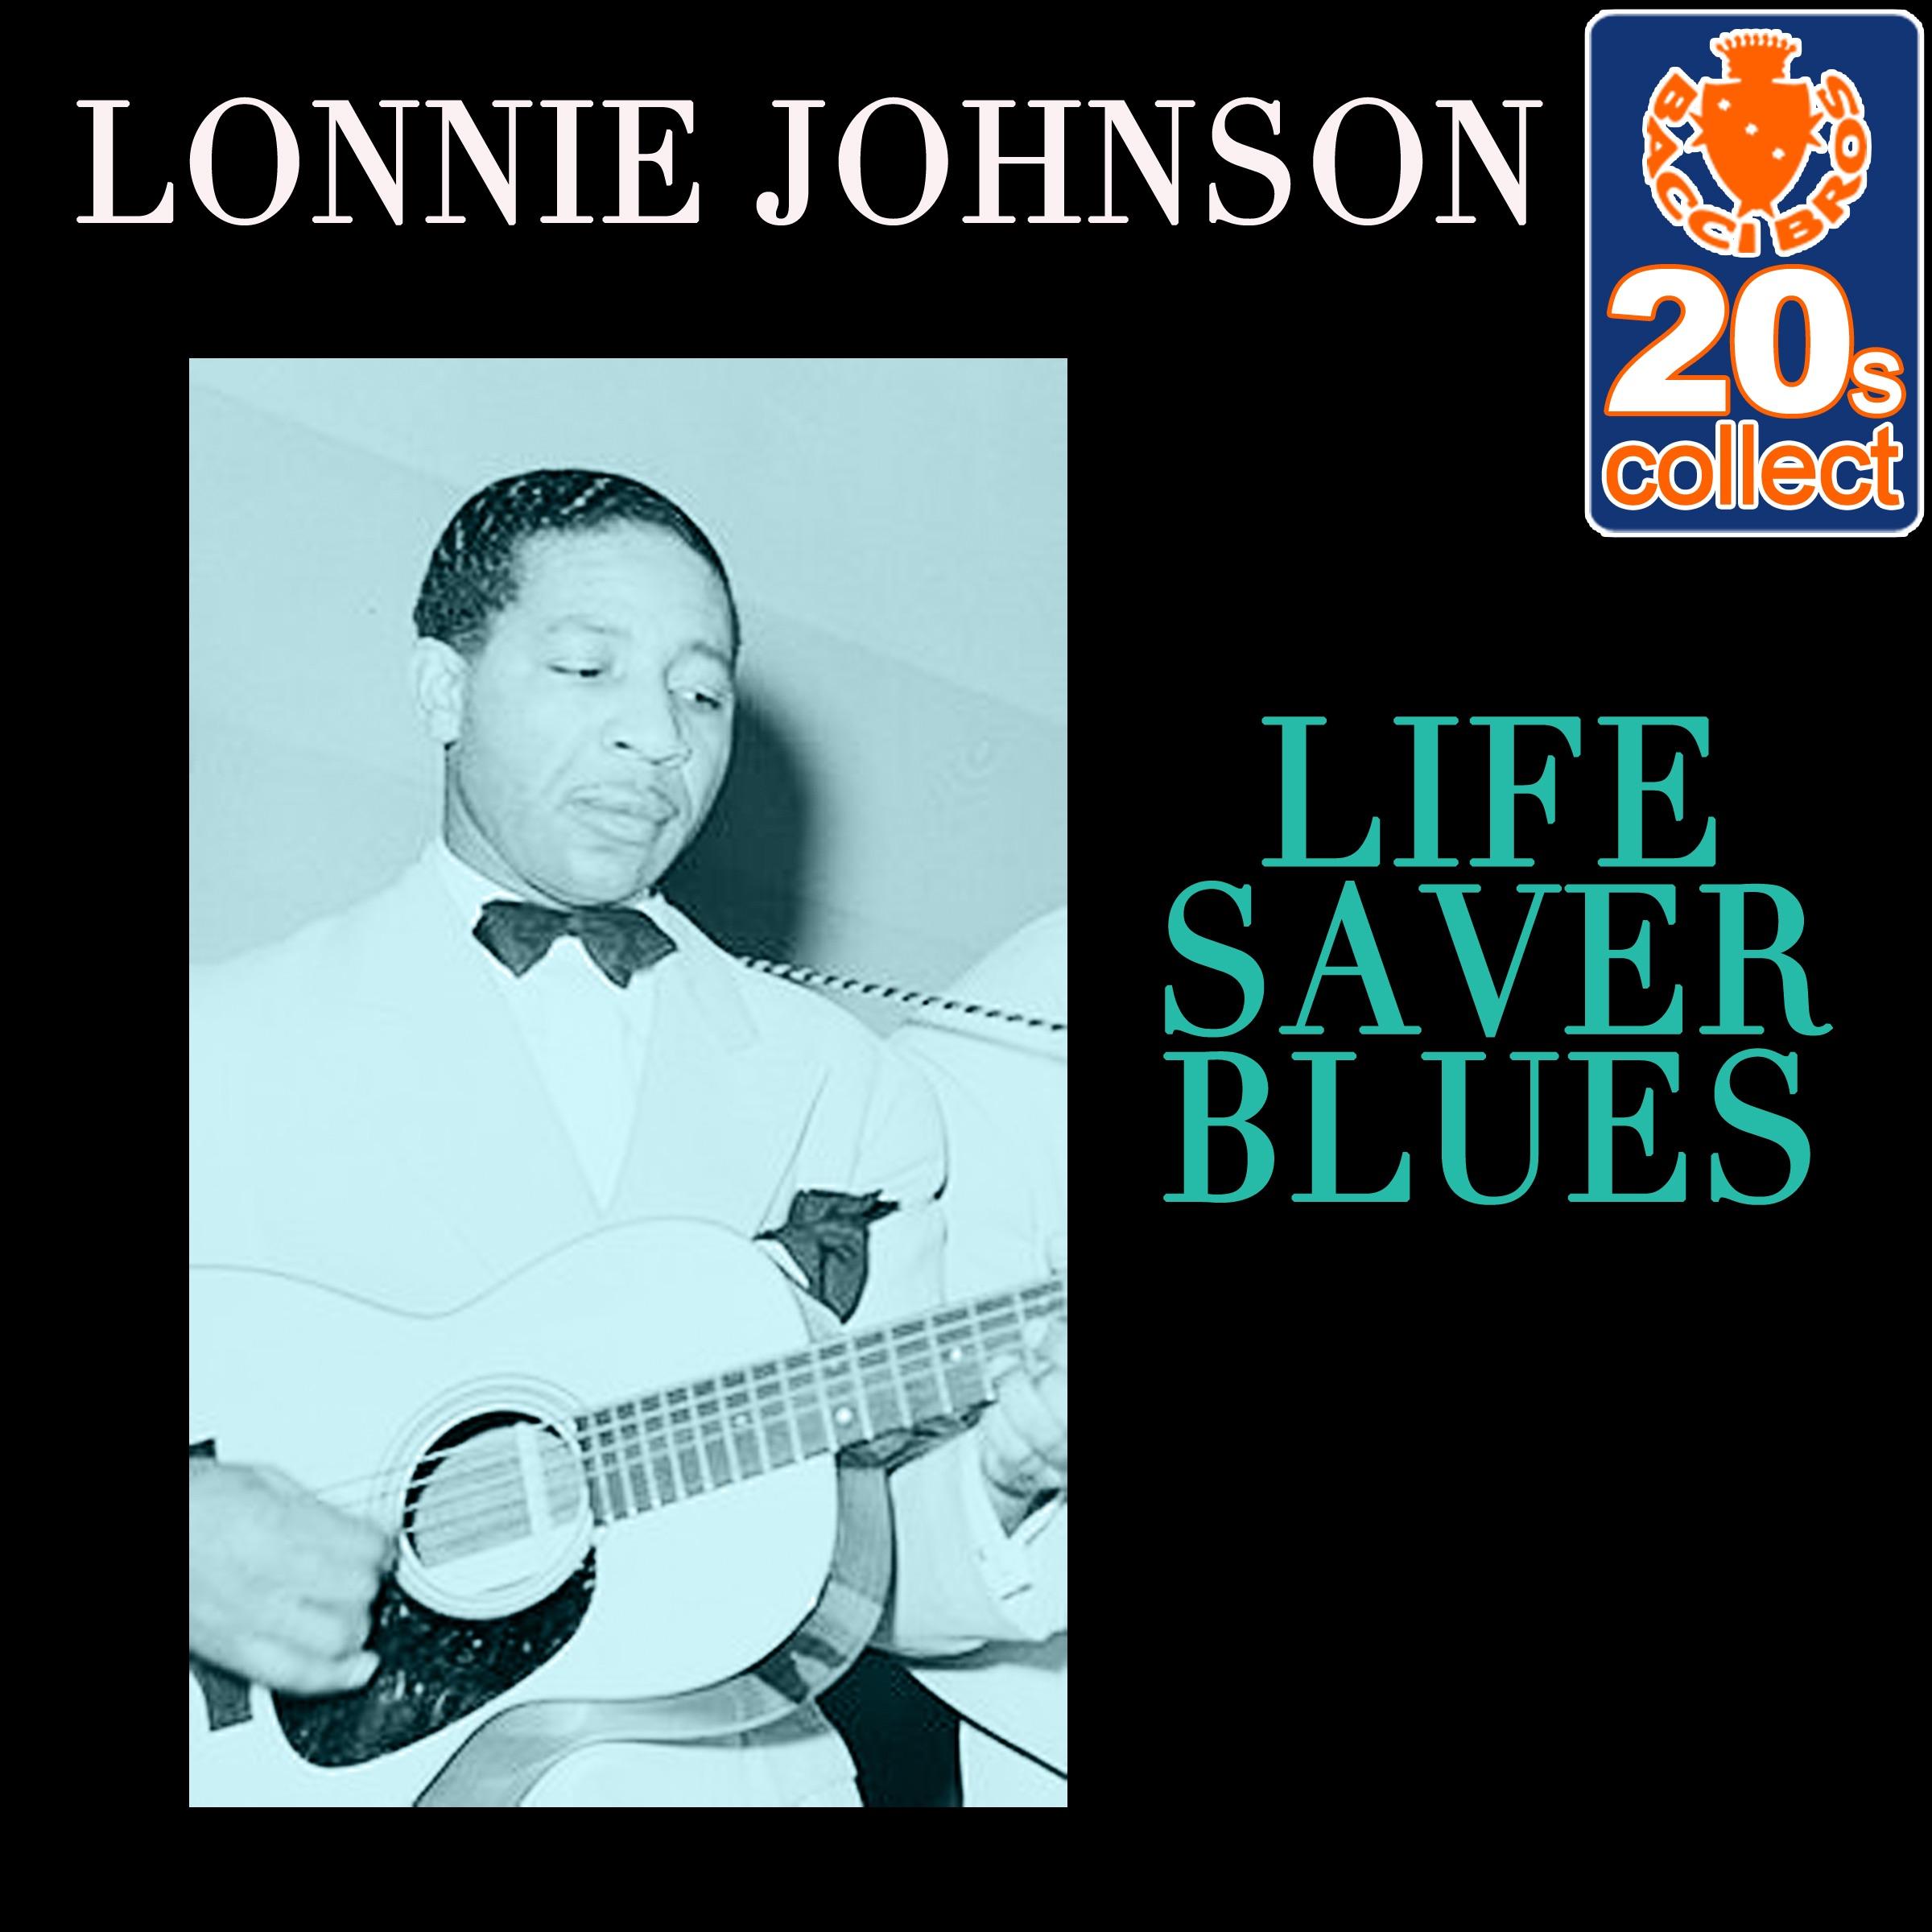 Life Saver Blues (Remastered) - Single